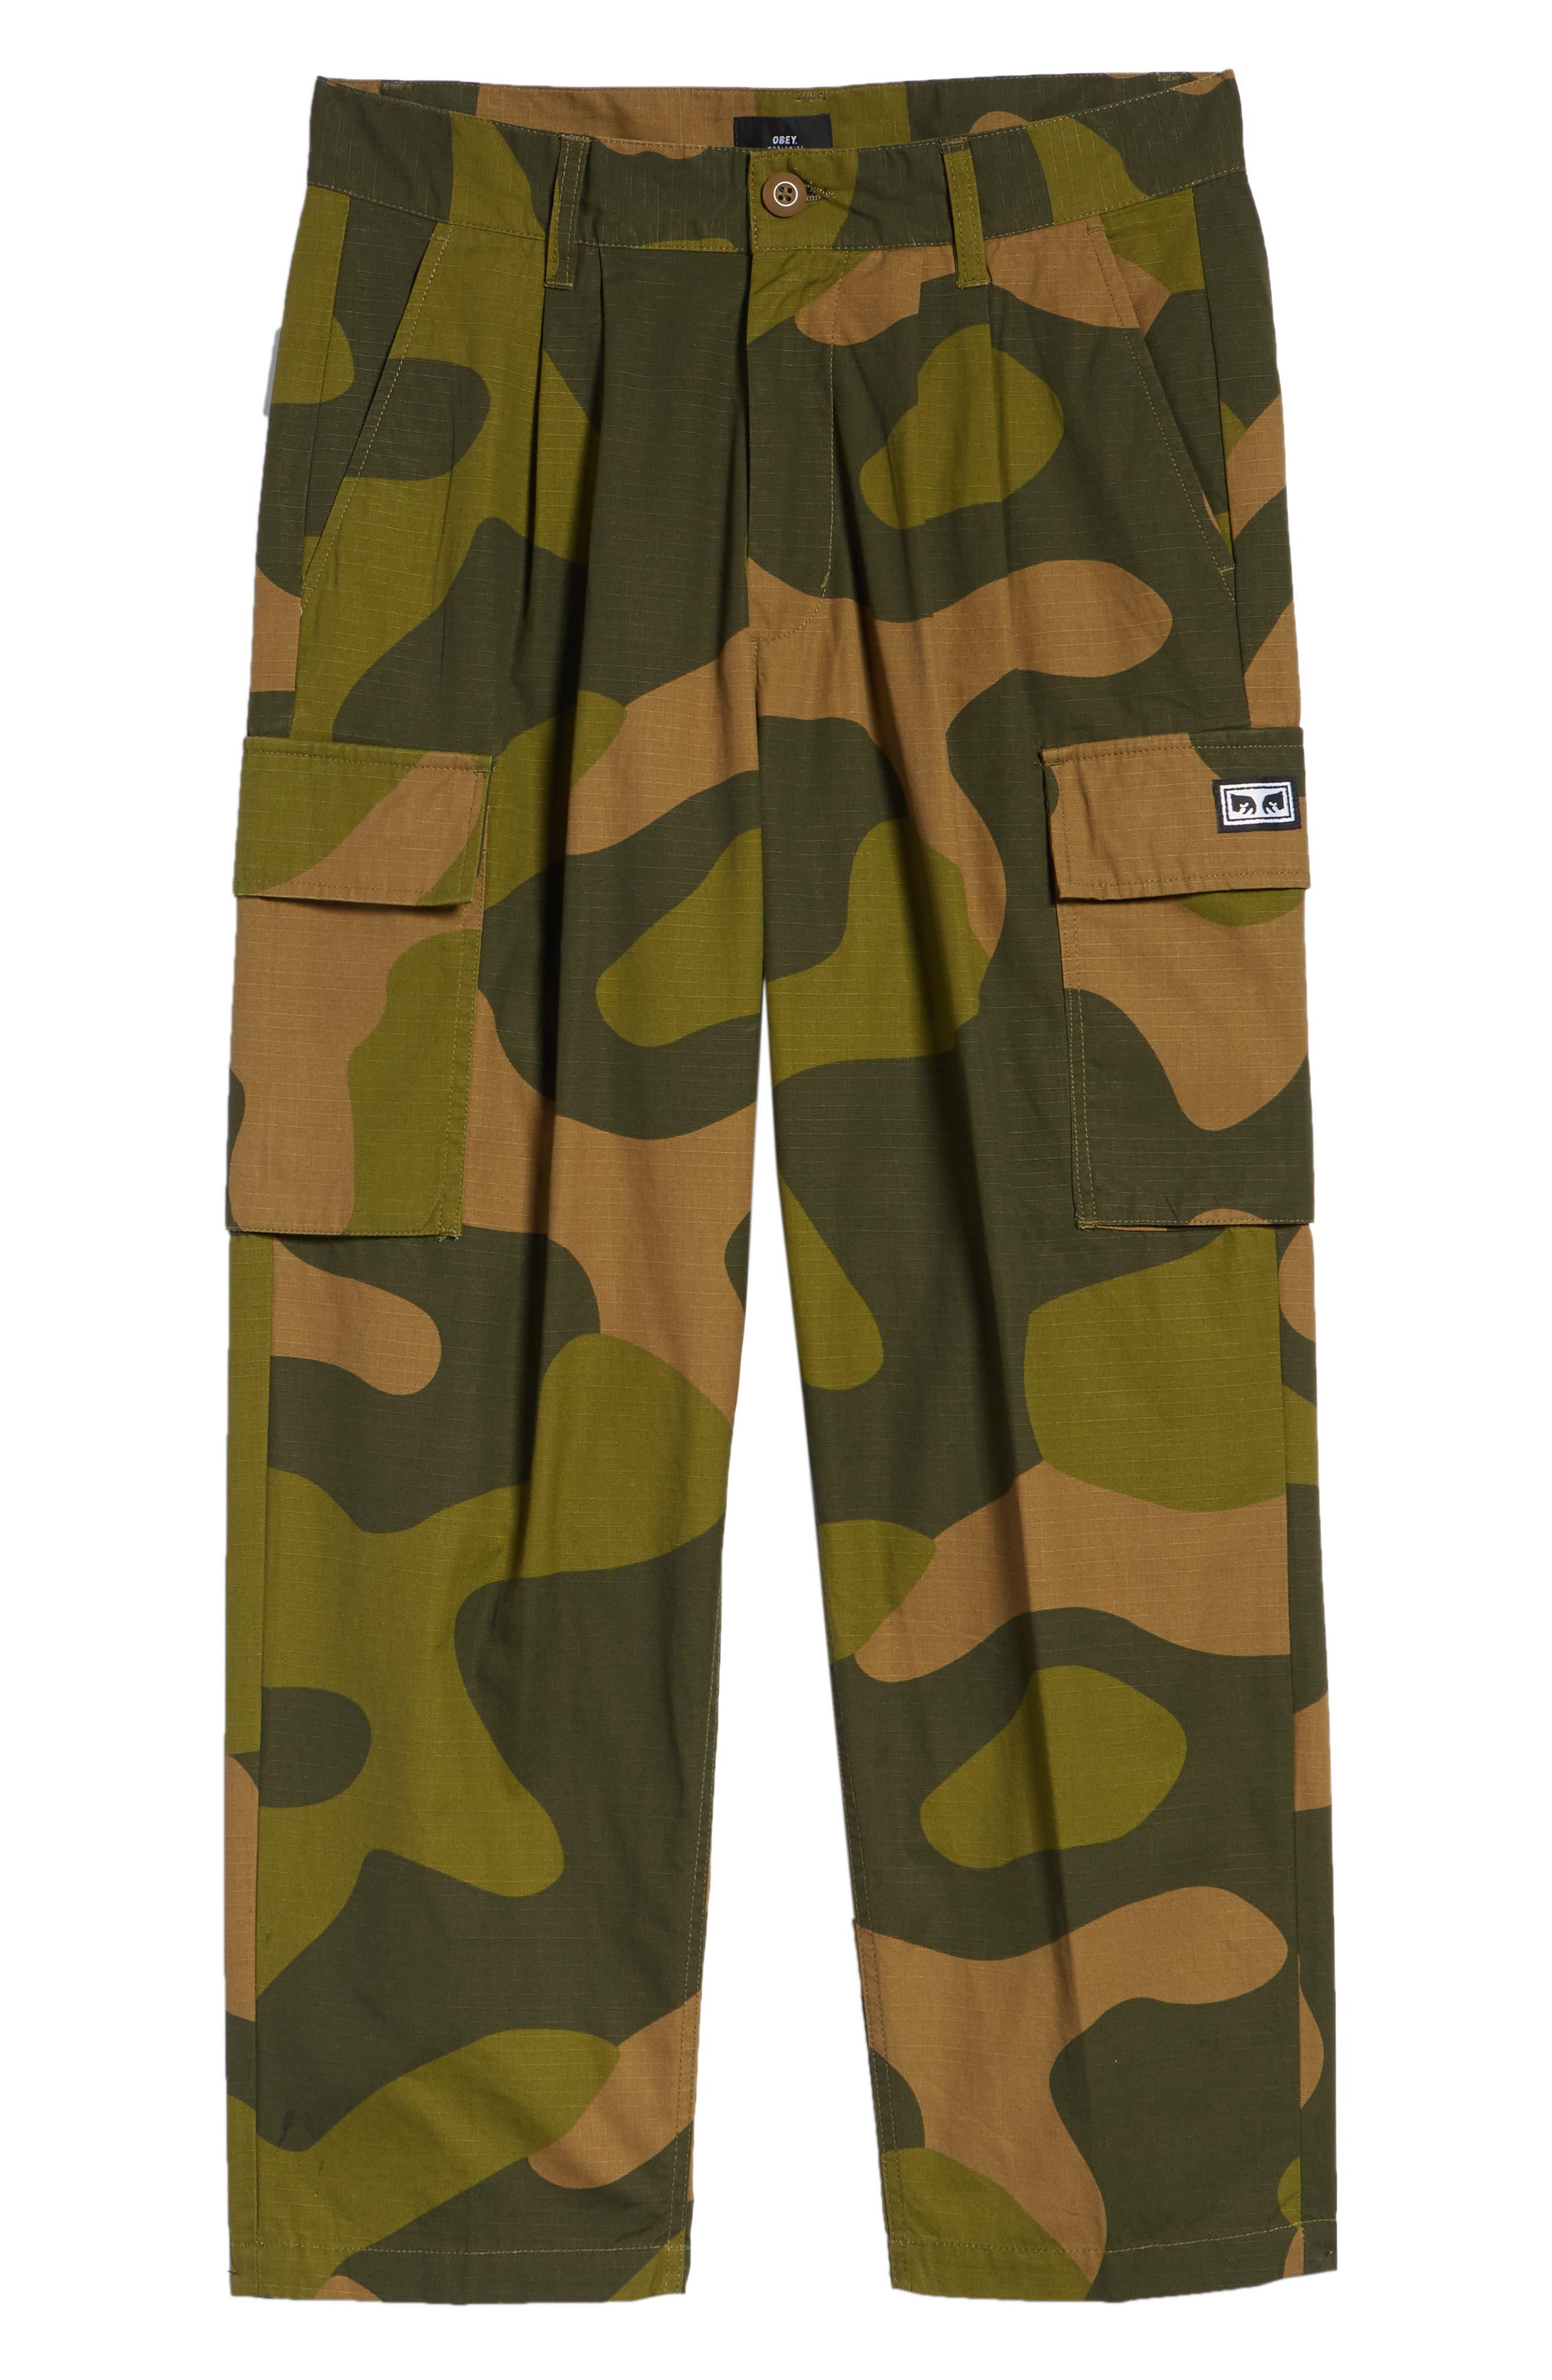 Fubar Relaxed Fit Cargo Pants,                             Alternate thumbnail 6, color,                             305